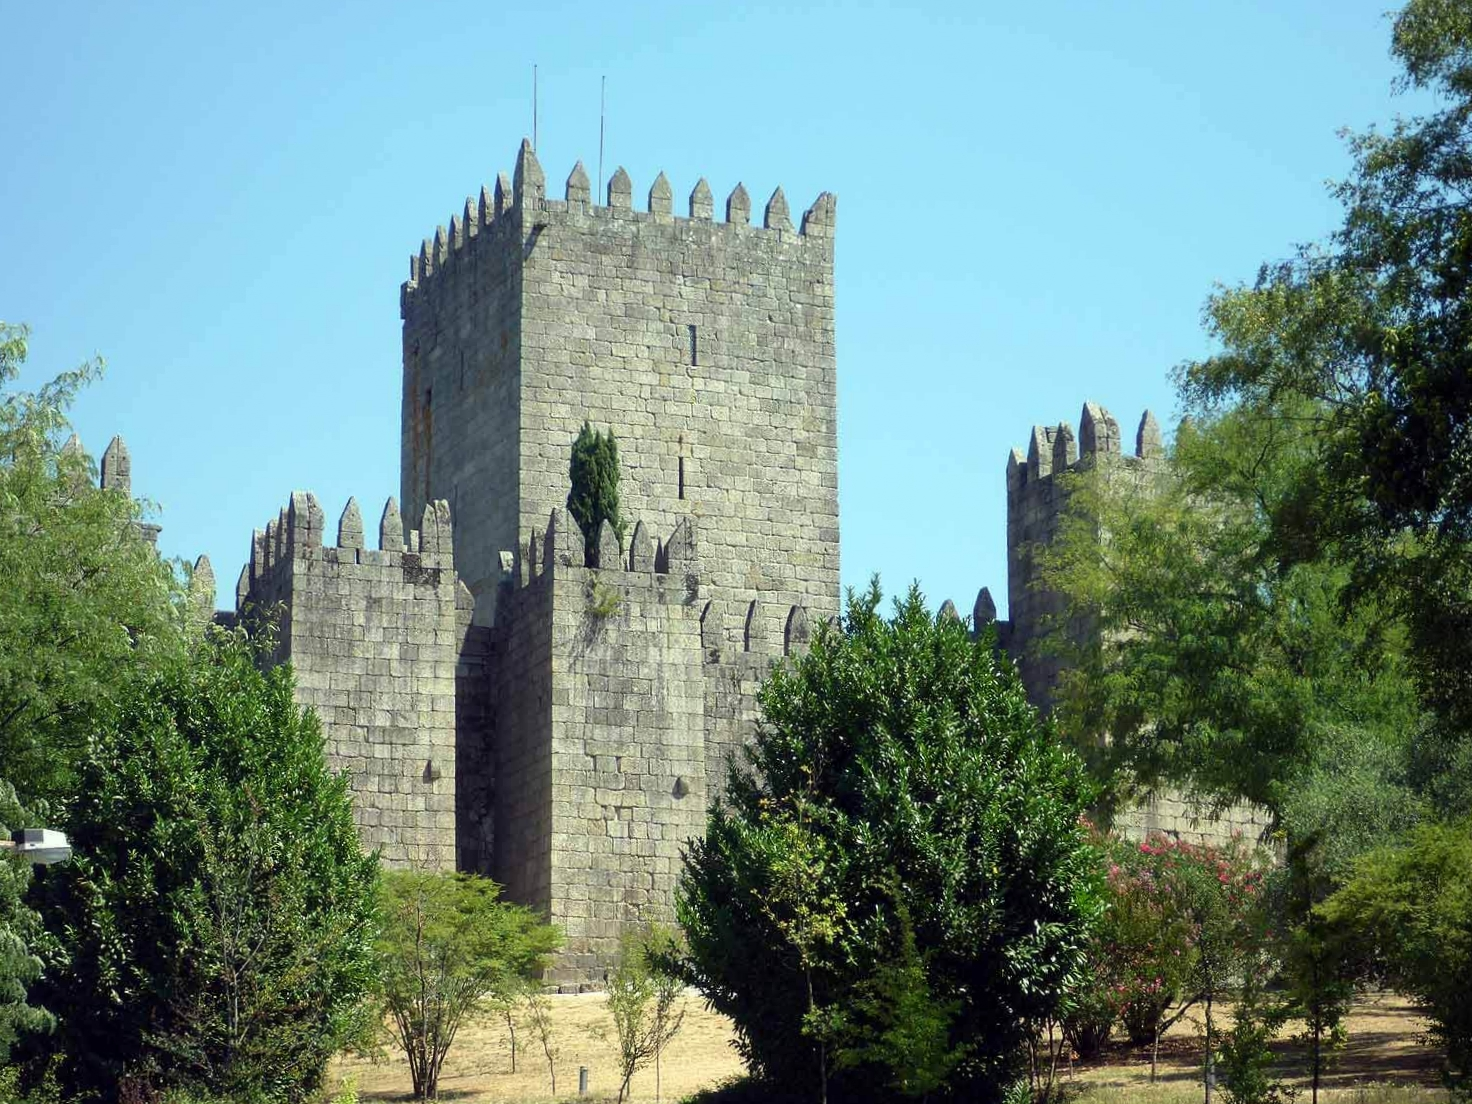 portugal-guimaraes-castle.JPG